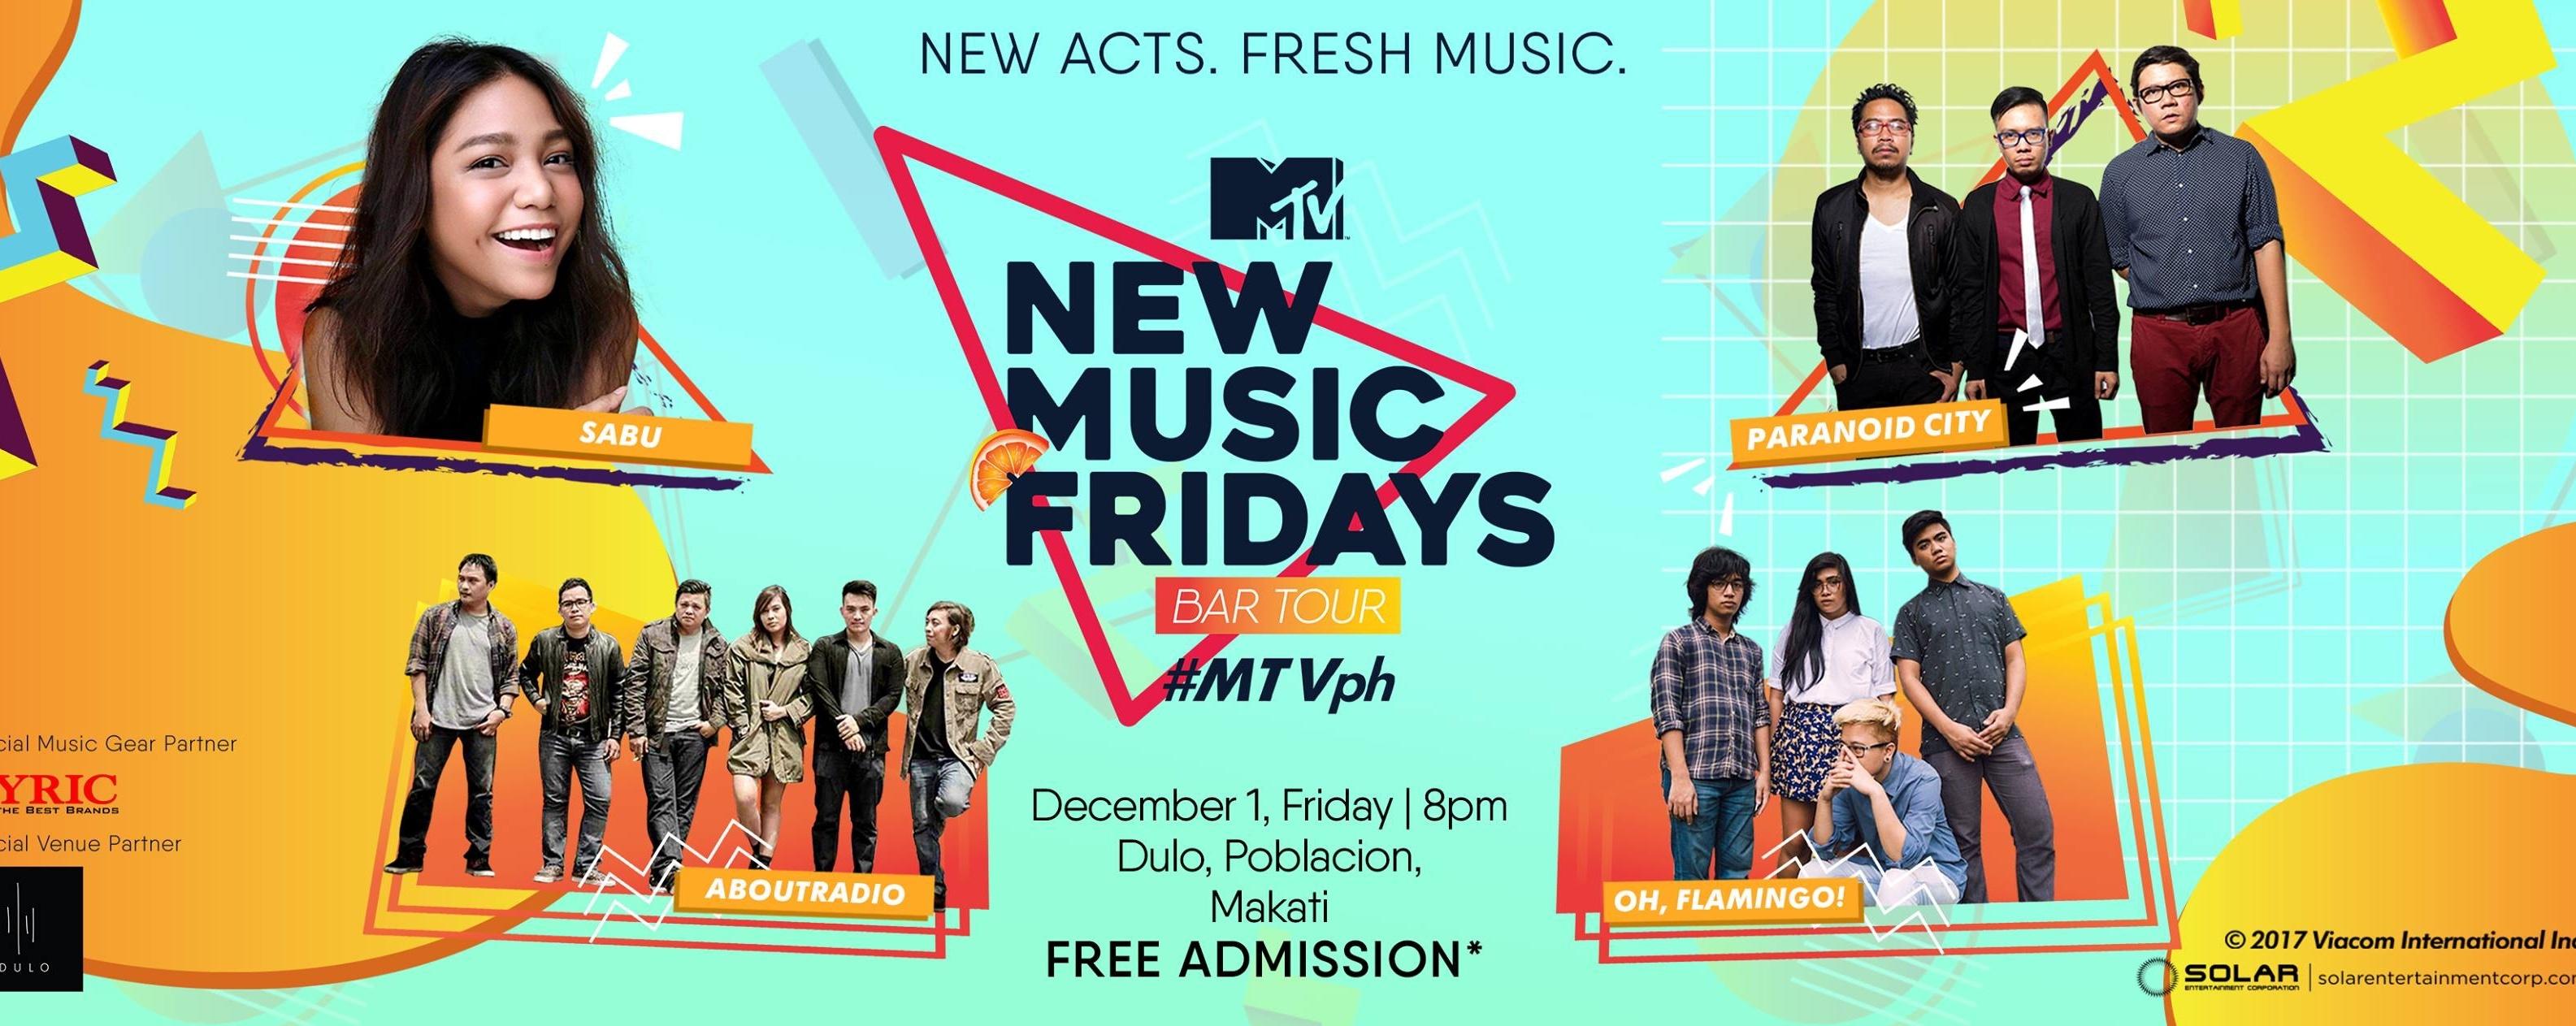 MTV New Music Fridays Bar Tour